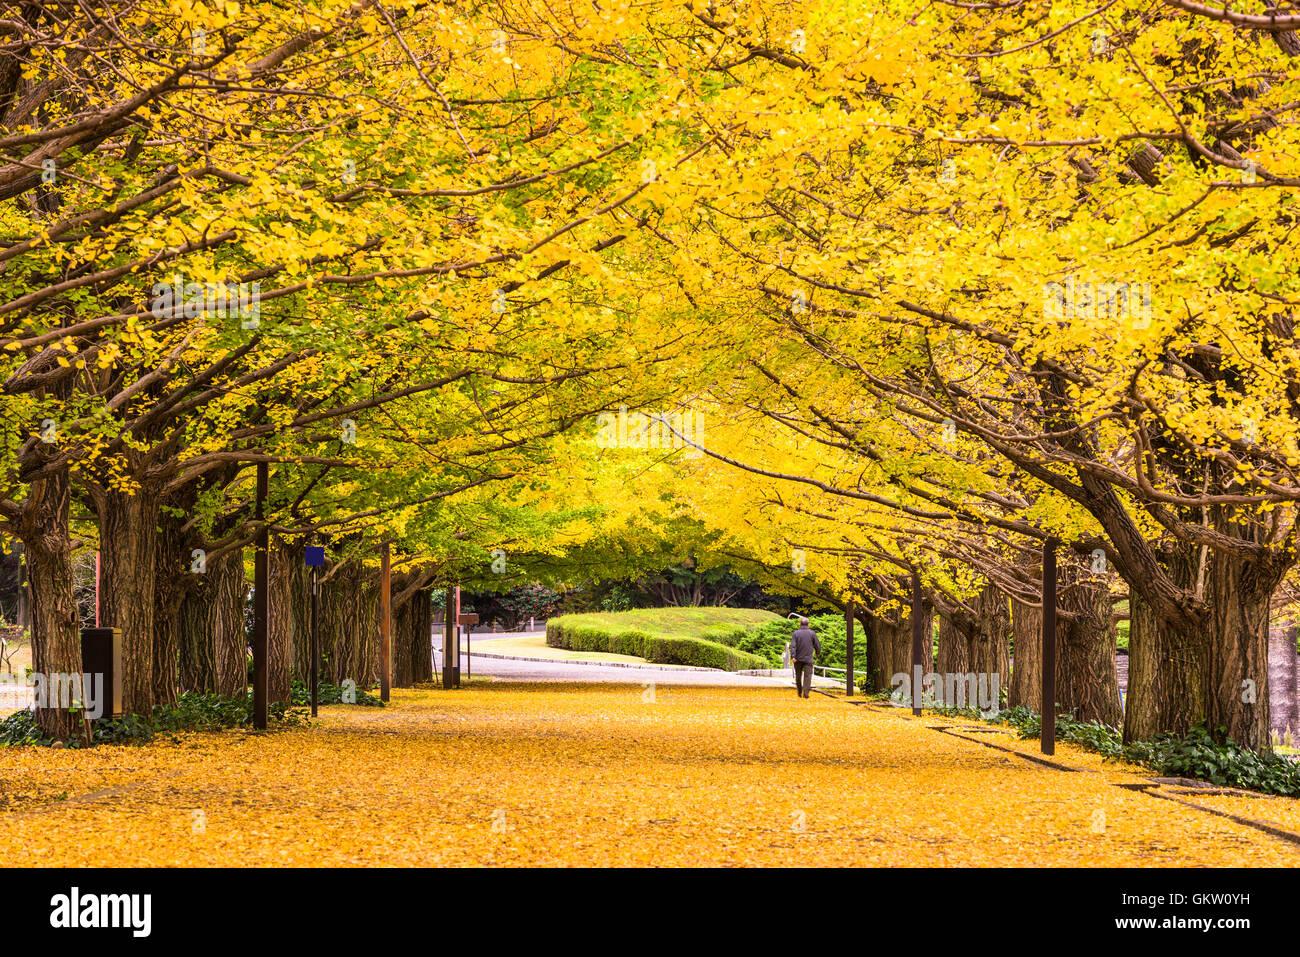 Tokyo, Japan autumn park. - Stock Image